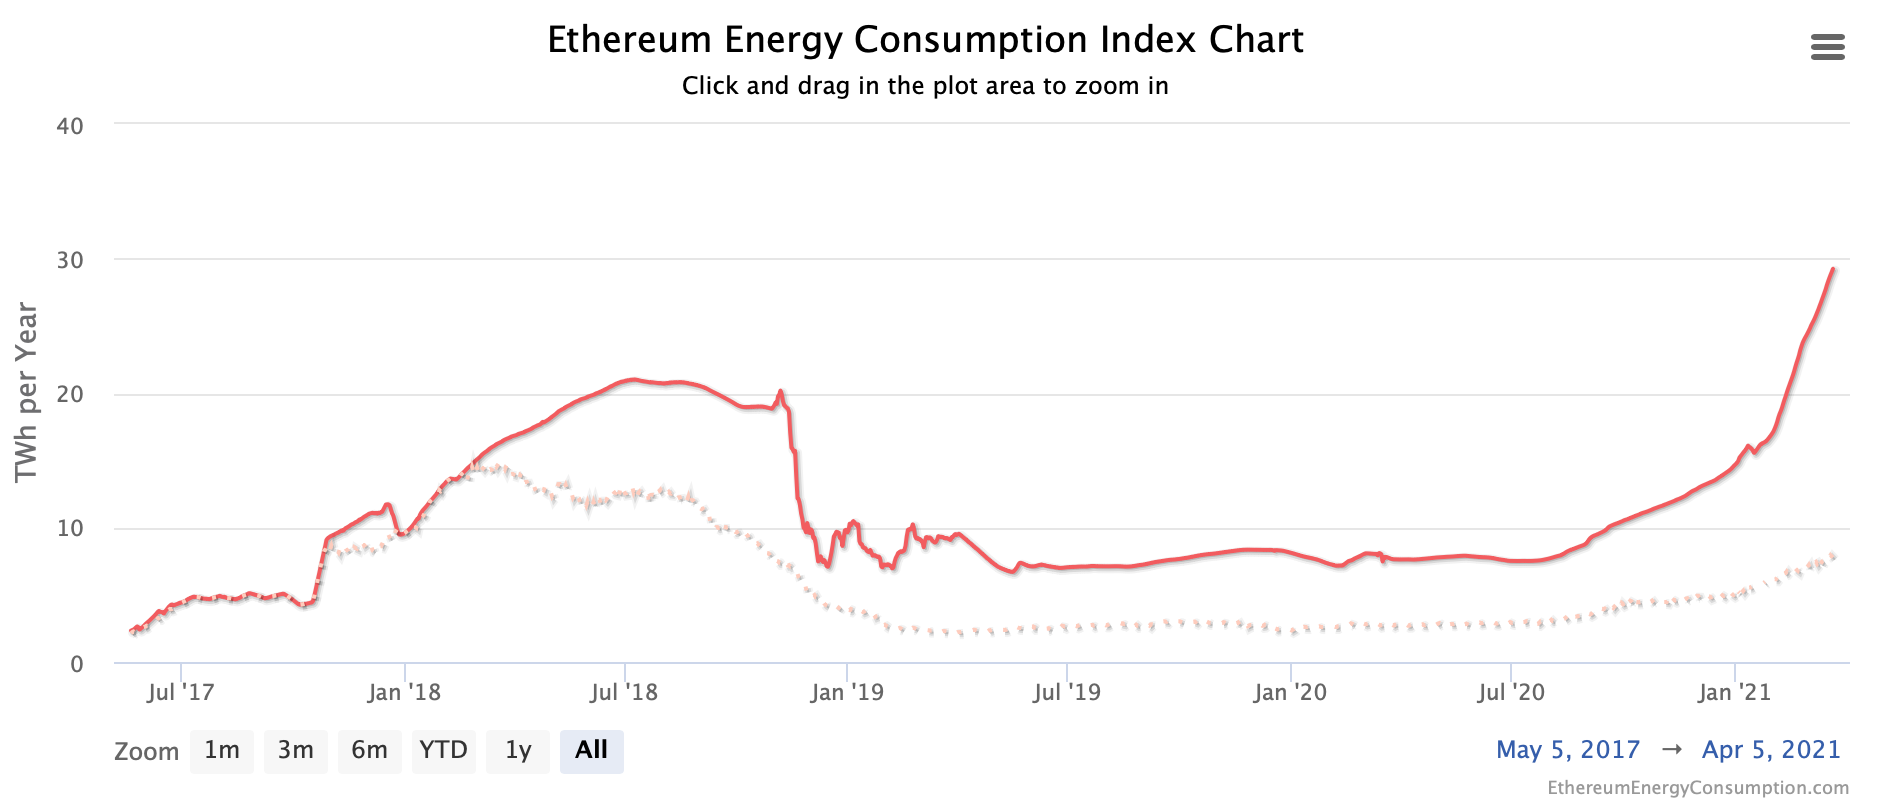 Ethereum Energy Consumption